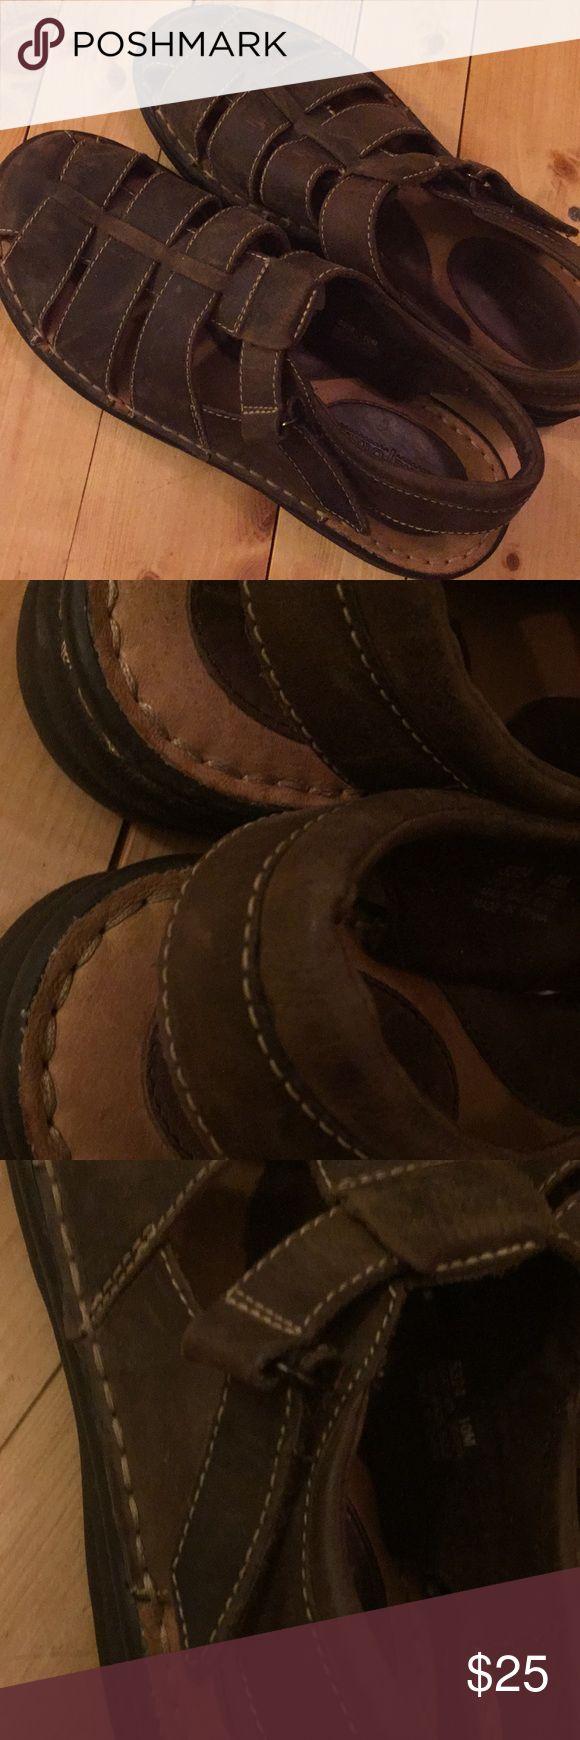 Minnetonka sandals Excellent condition very cozy Minnetonka Shoes Sandals & Flip-Flops